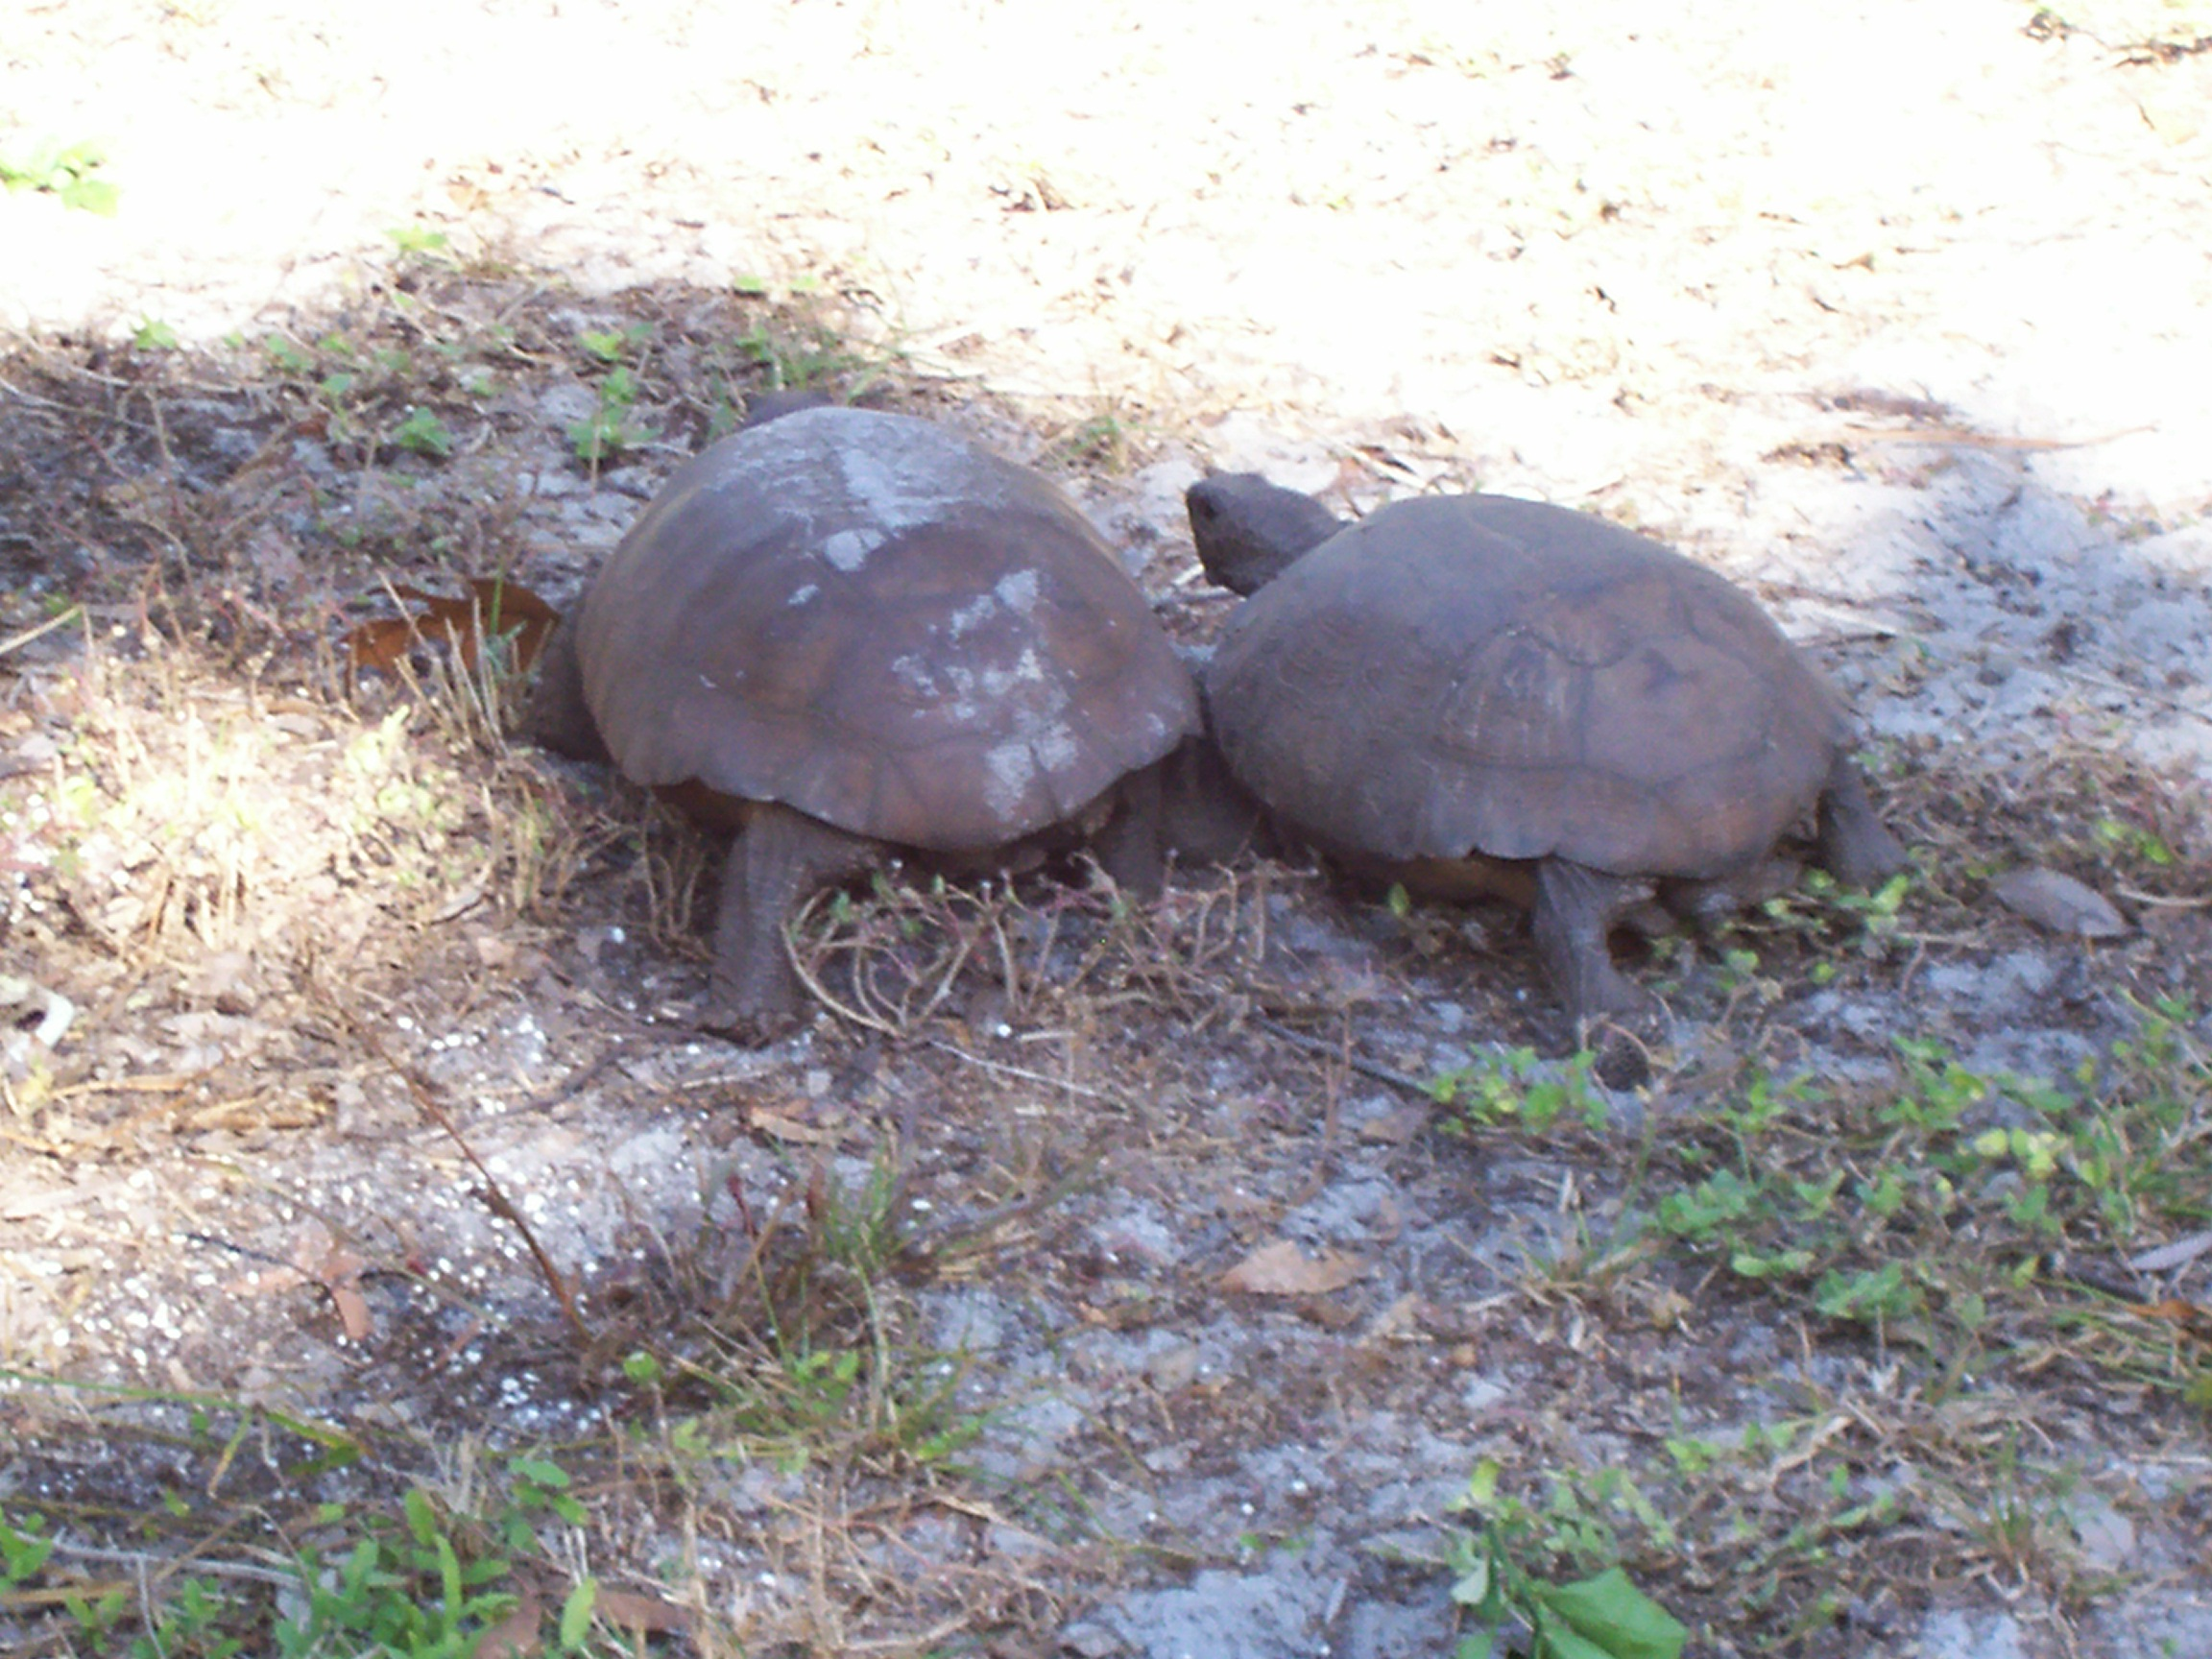 Florida endangered gopher tortoise photo